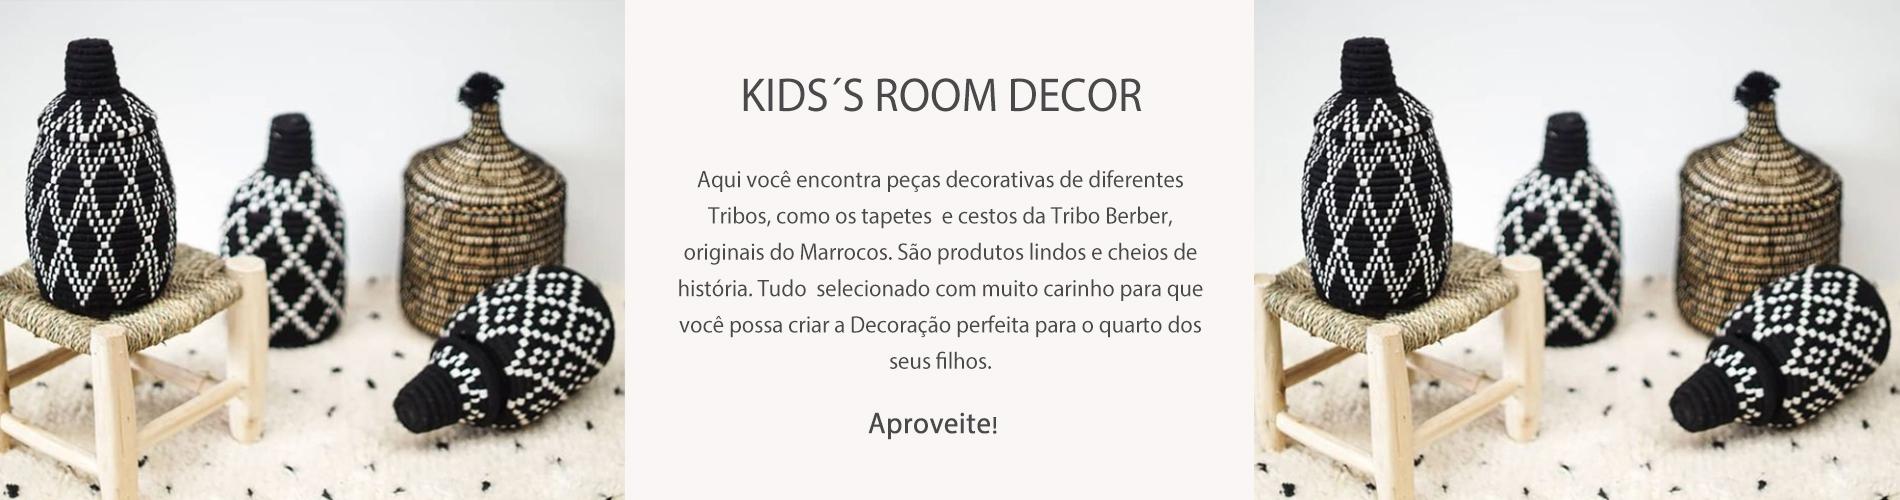 Kids Room Decor Categoria